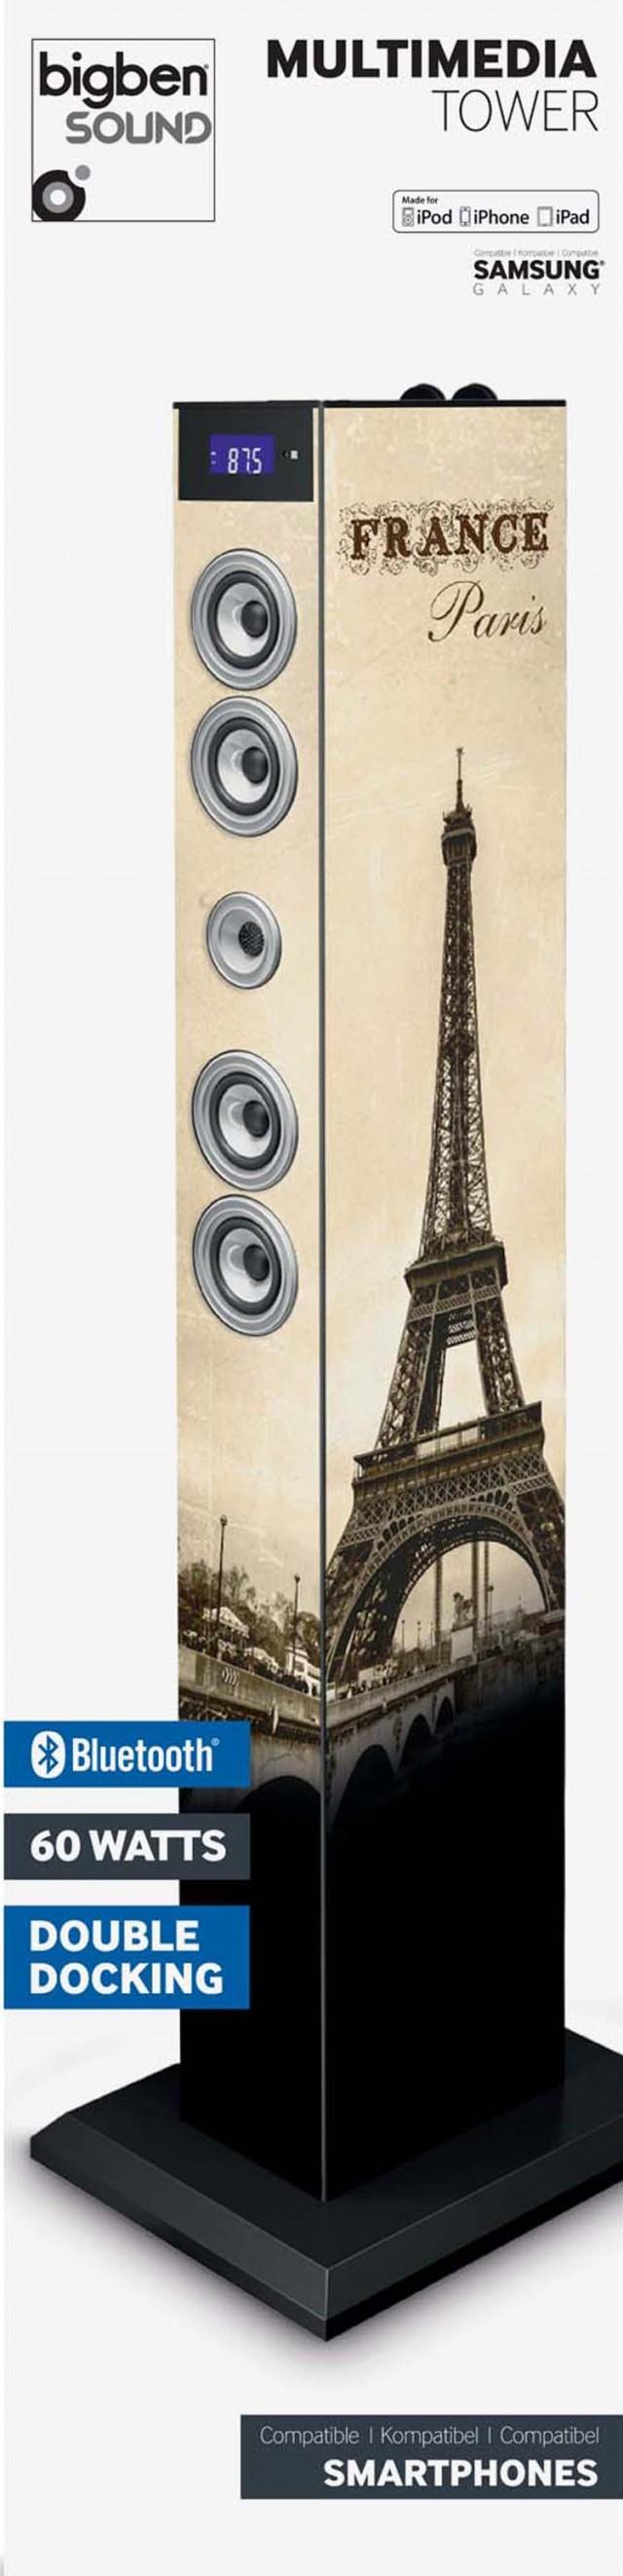 Sound Tower TW6 - Paris - Packshot